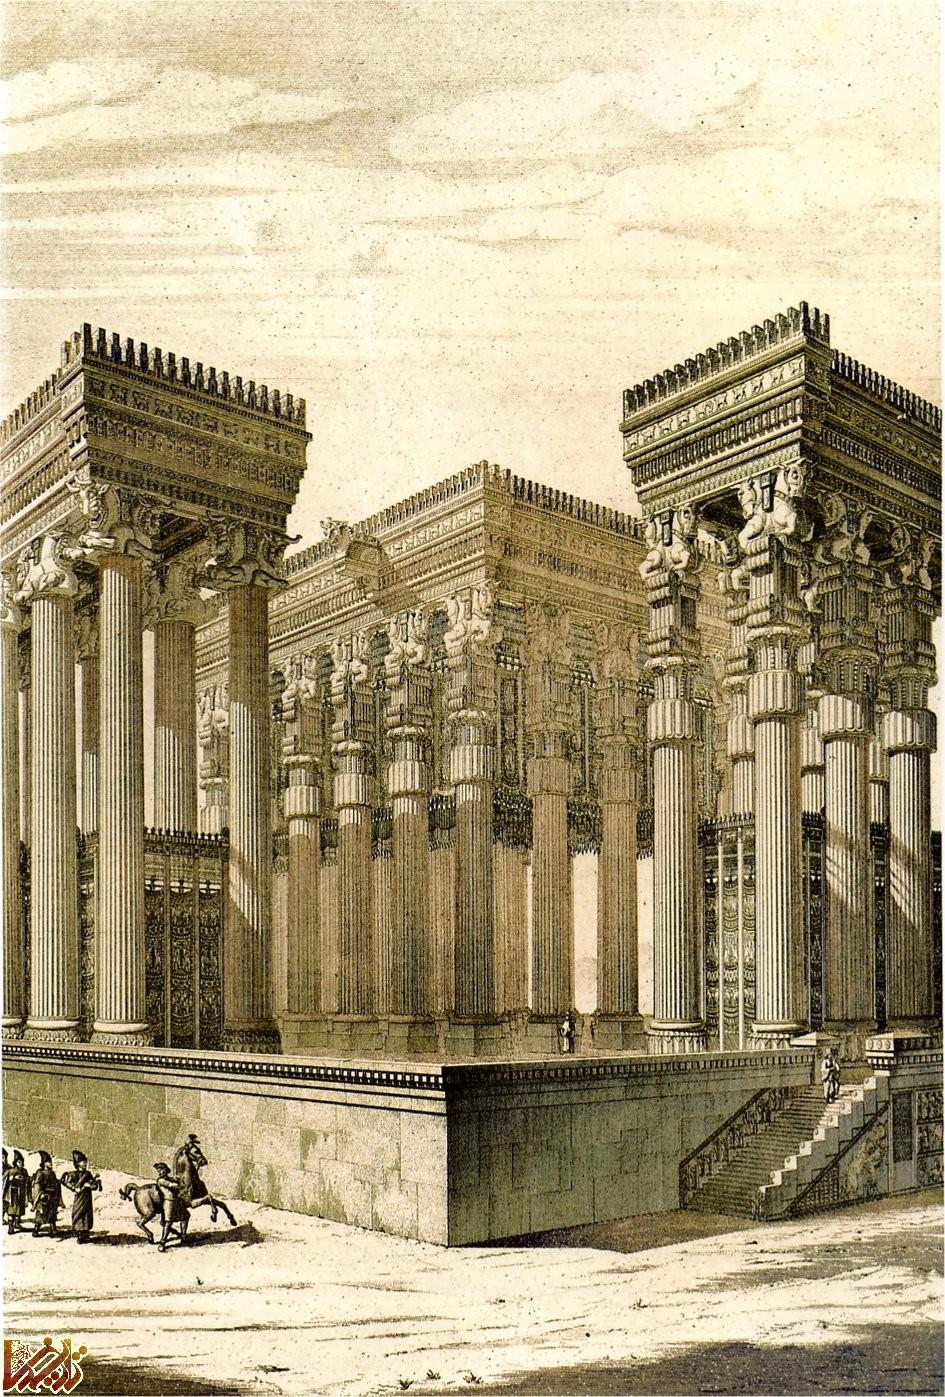 http://tarikhema.org/images/2011/08/Persepolis_Reconstruction_Apadana_Chipiez2.jpg